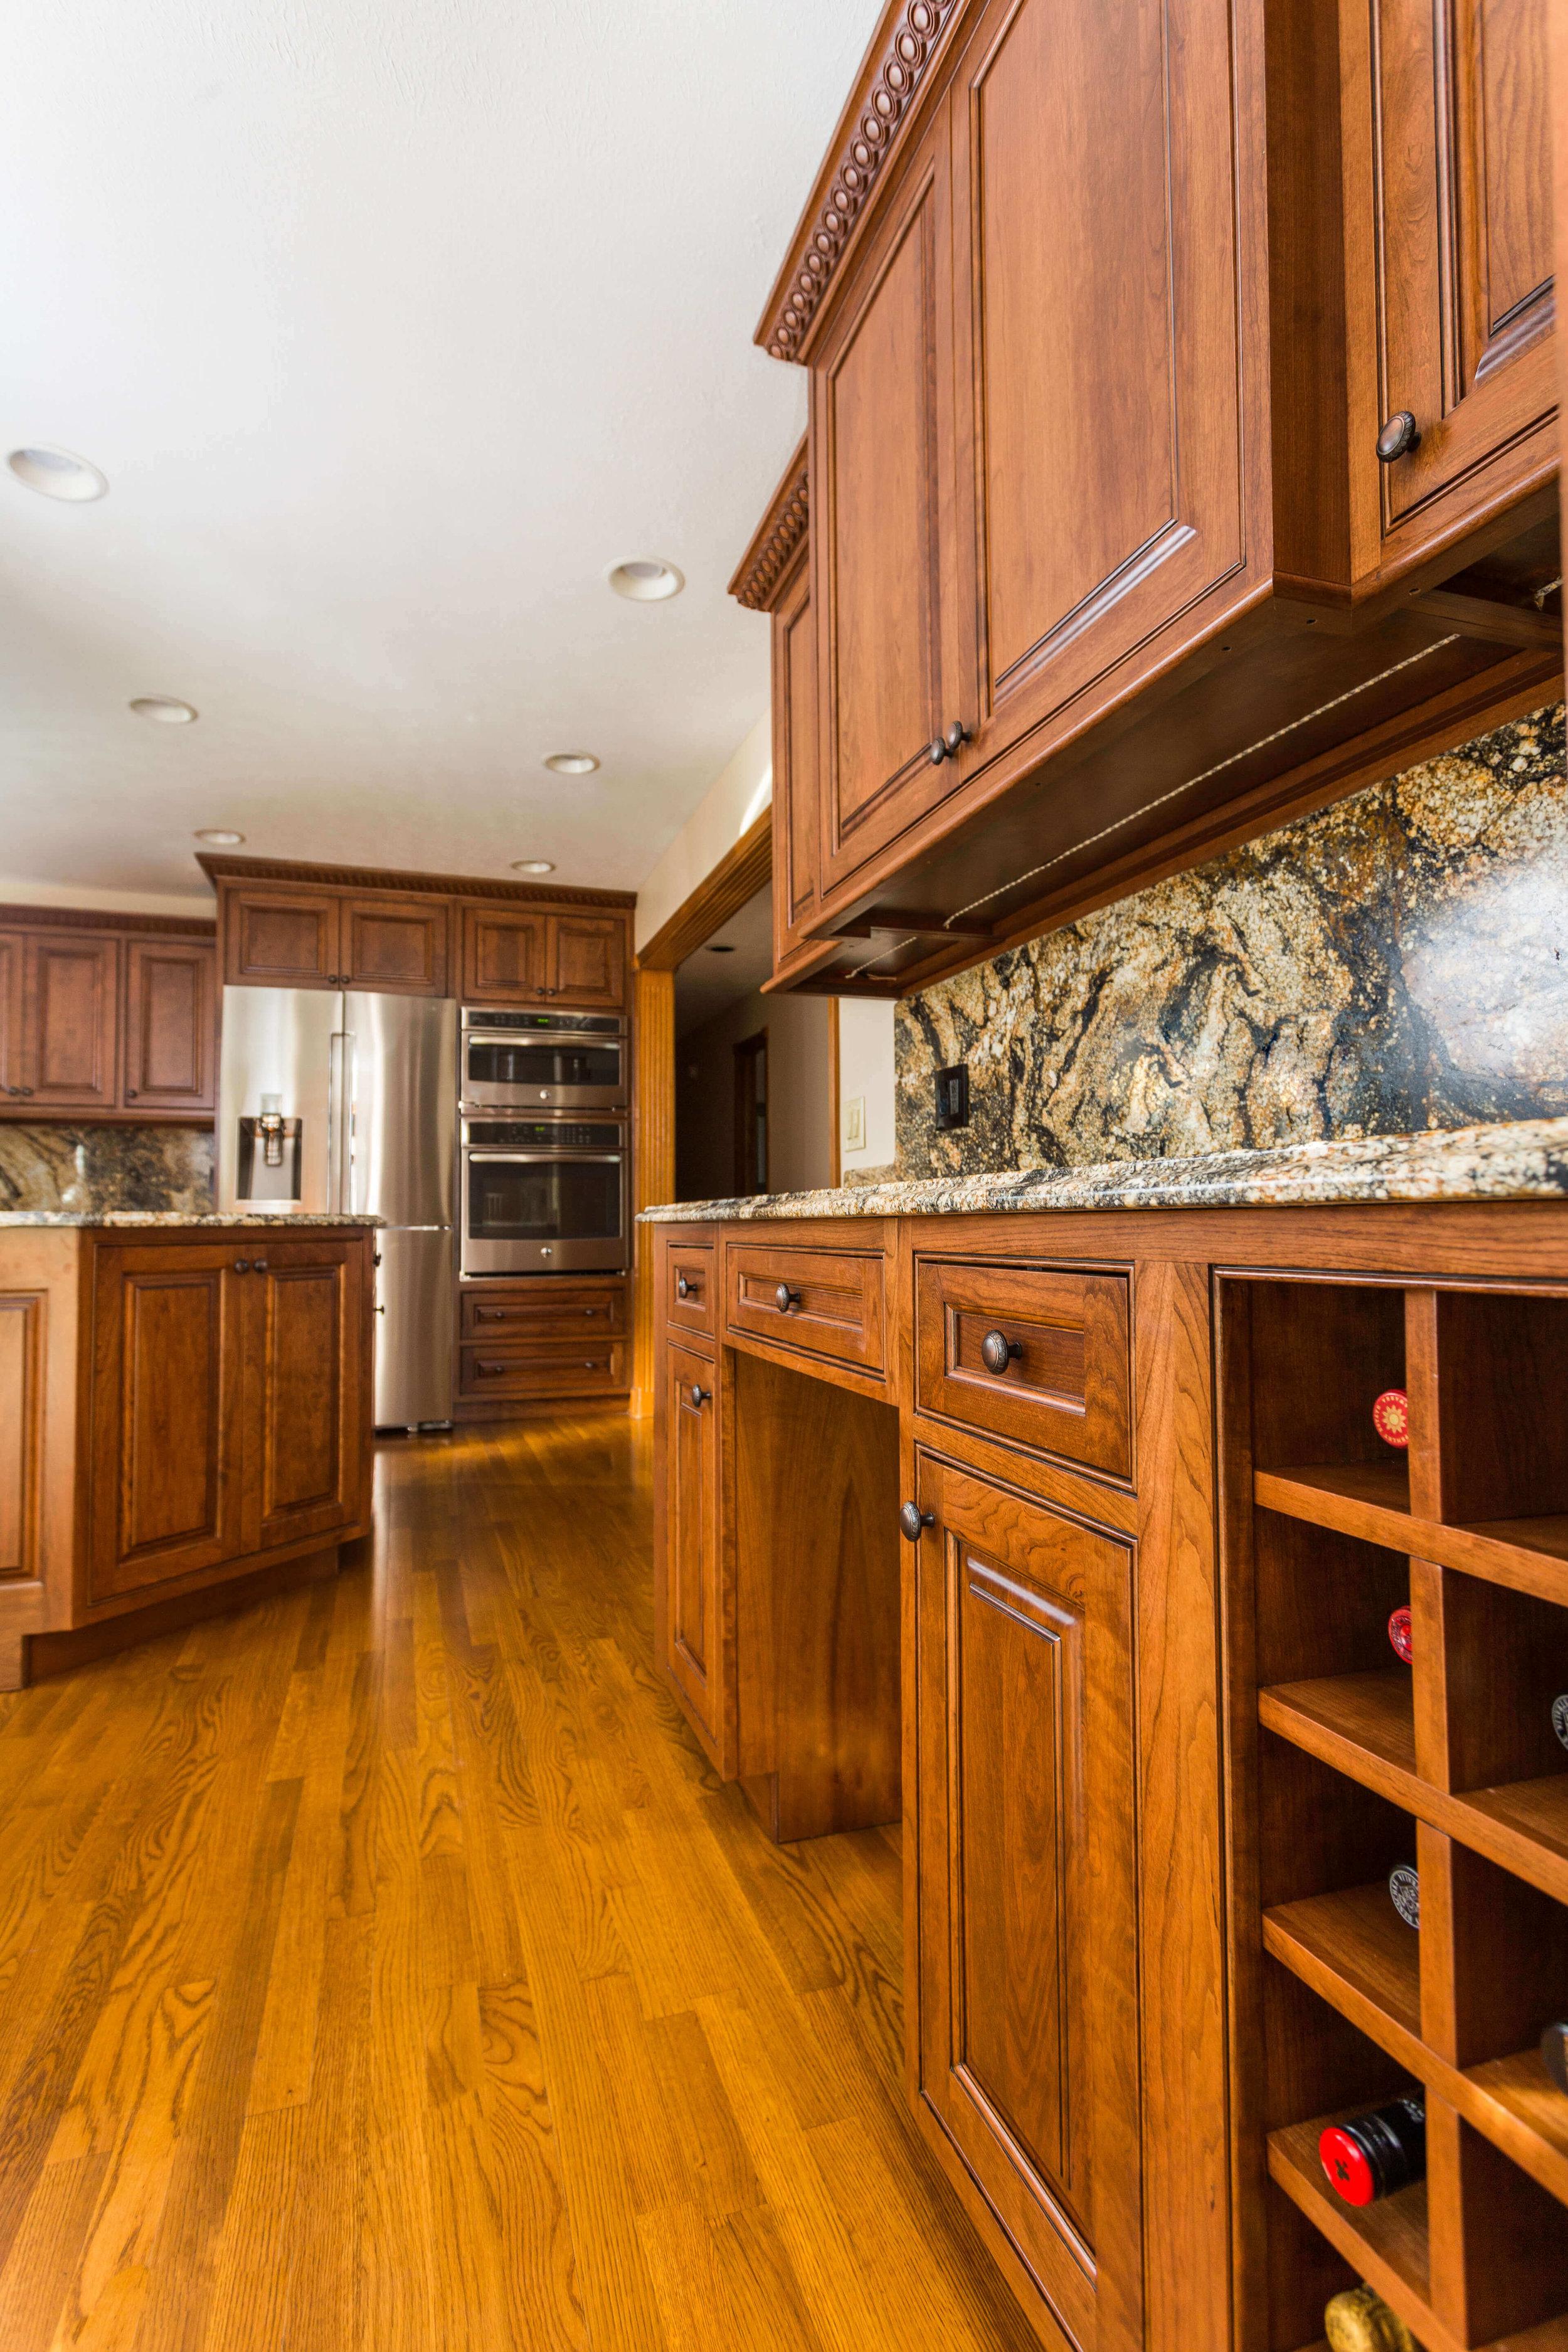 traditionalhaven - Kitchen Remodel